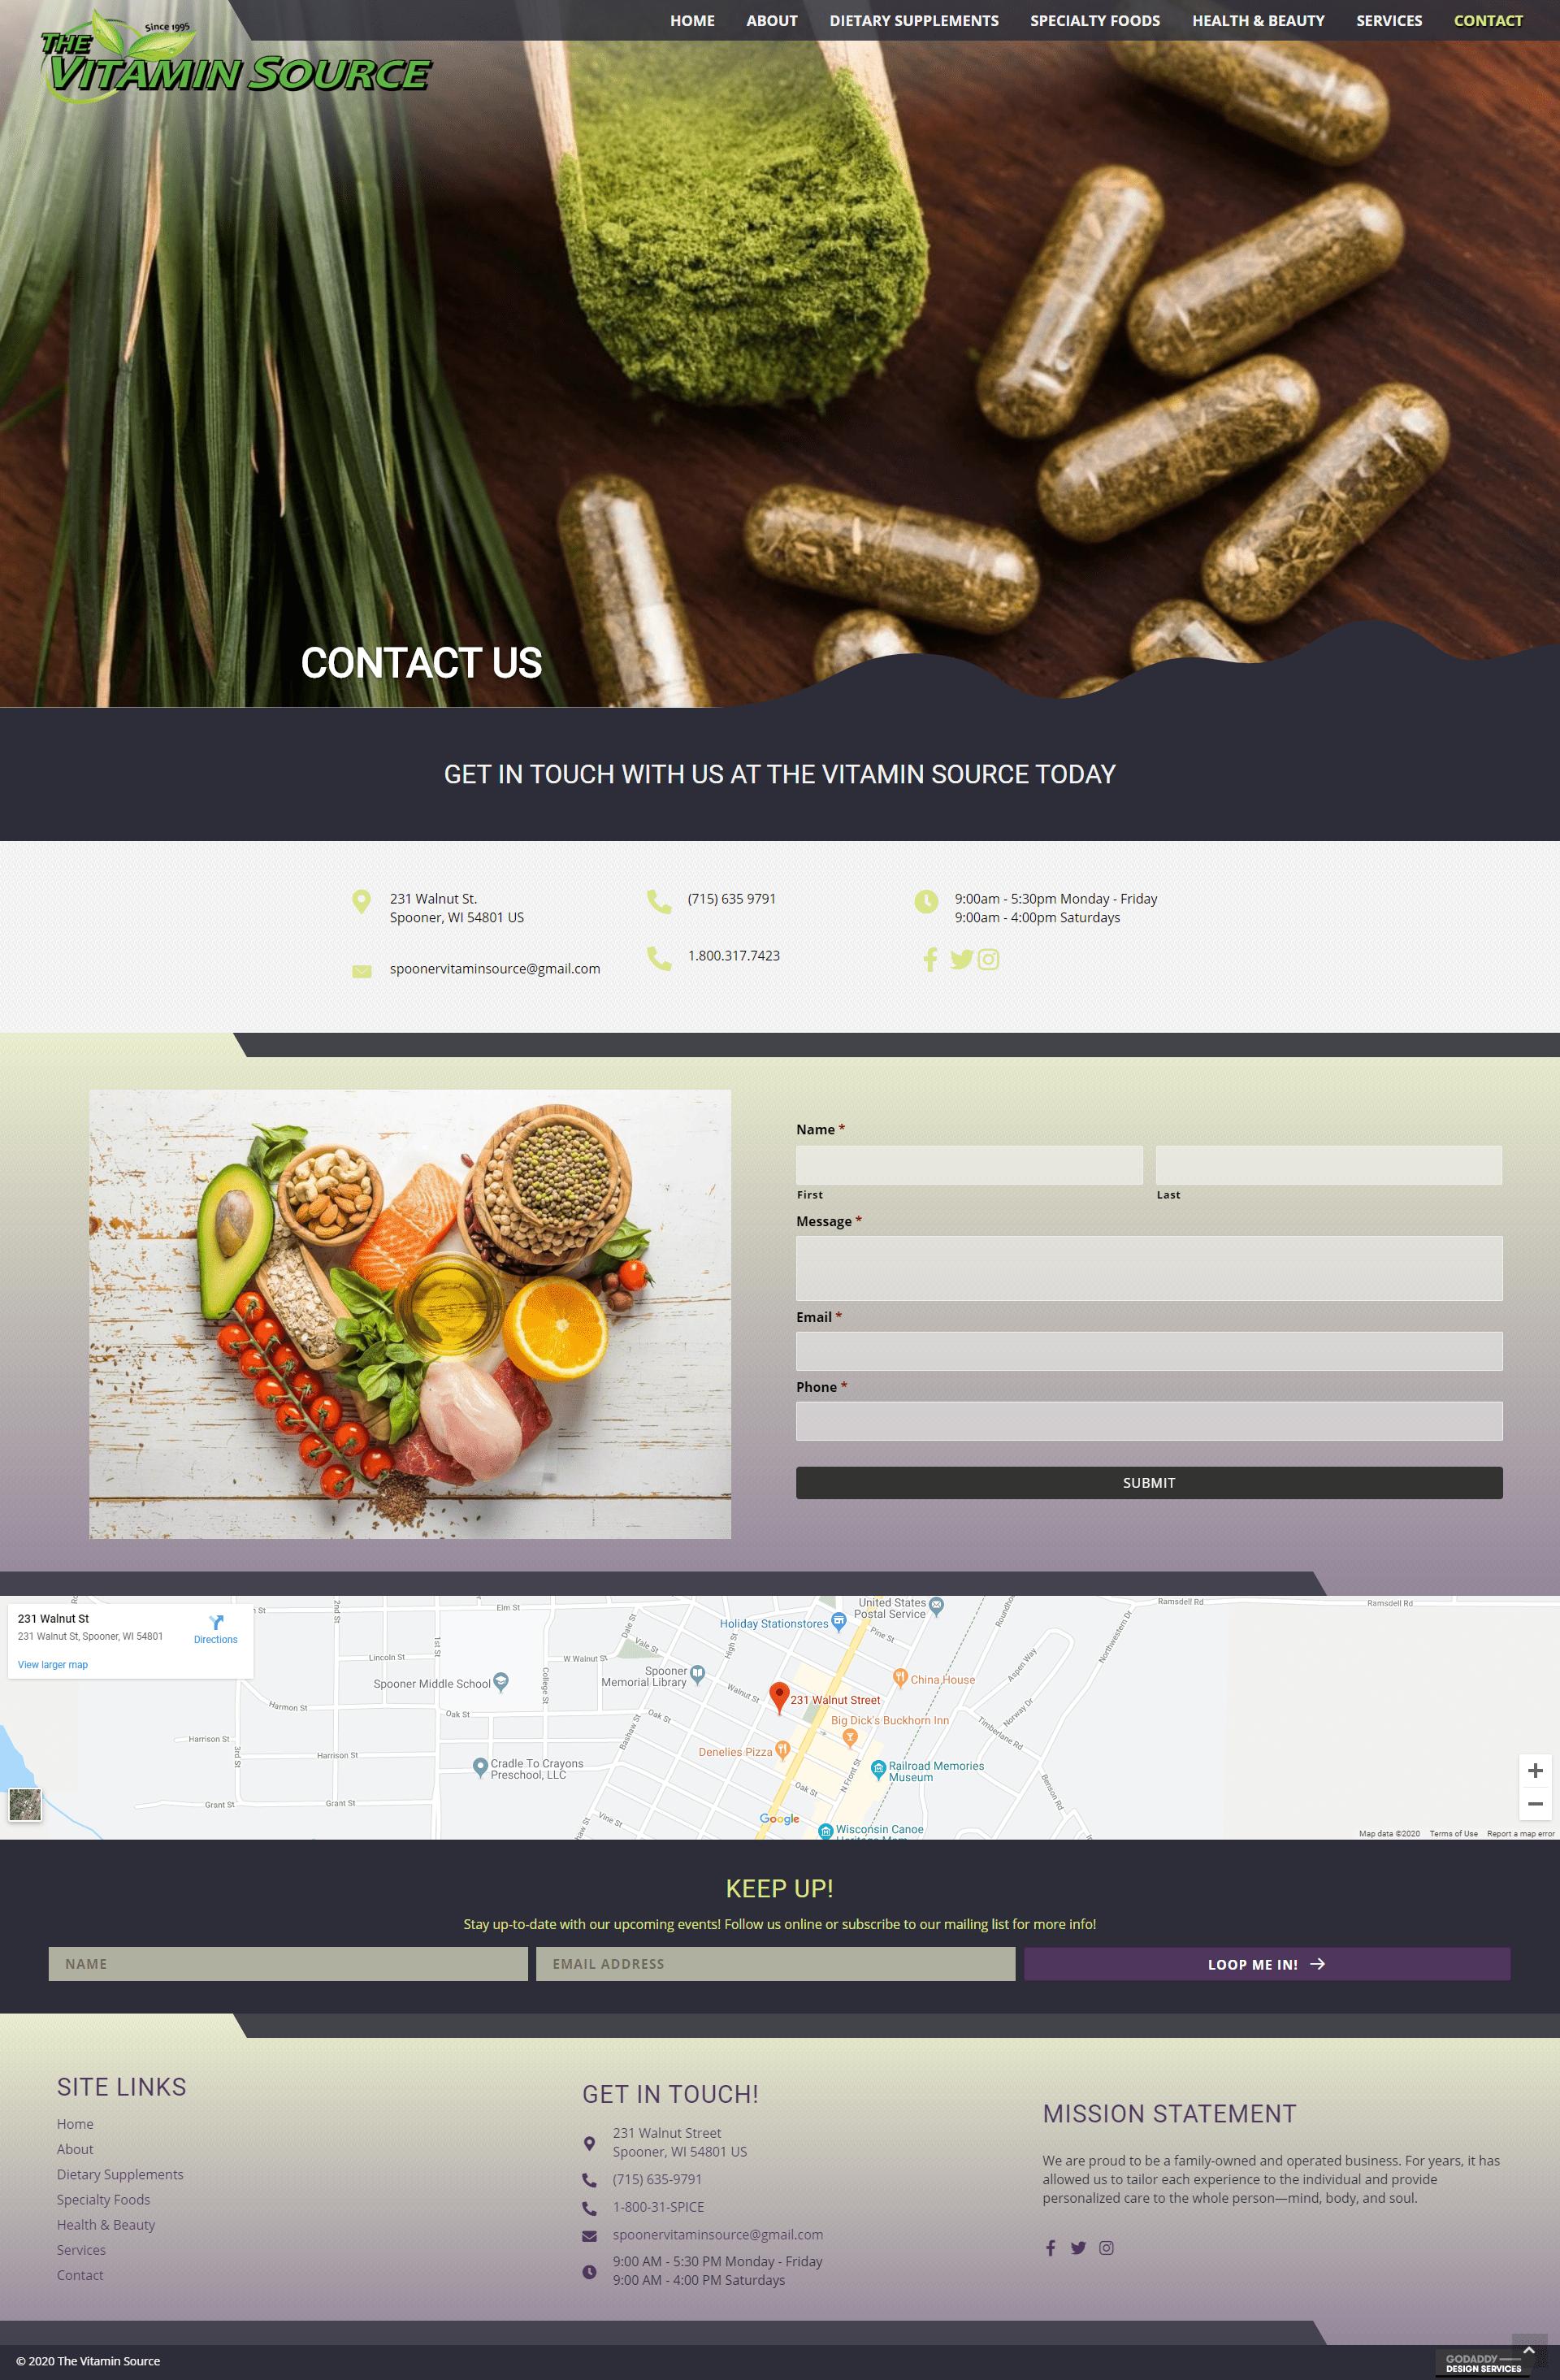 screencapture-The Vitamin Source-contact